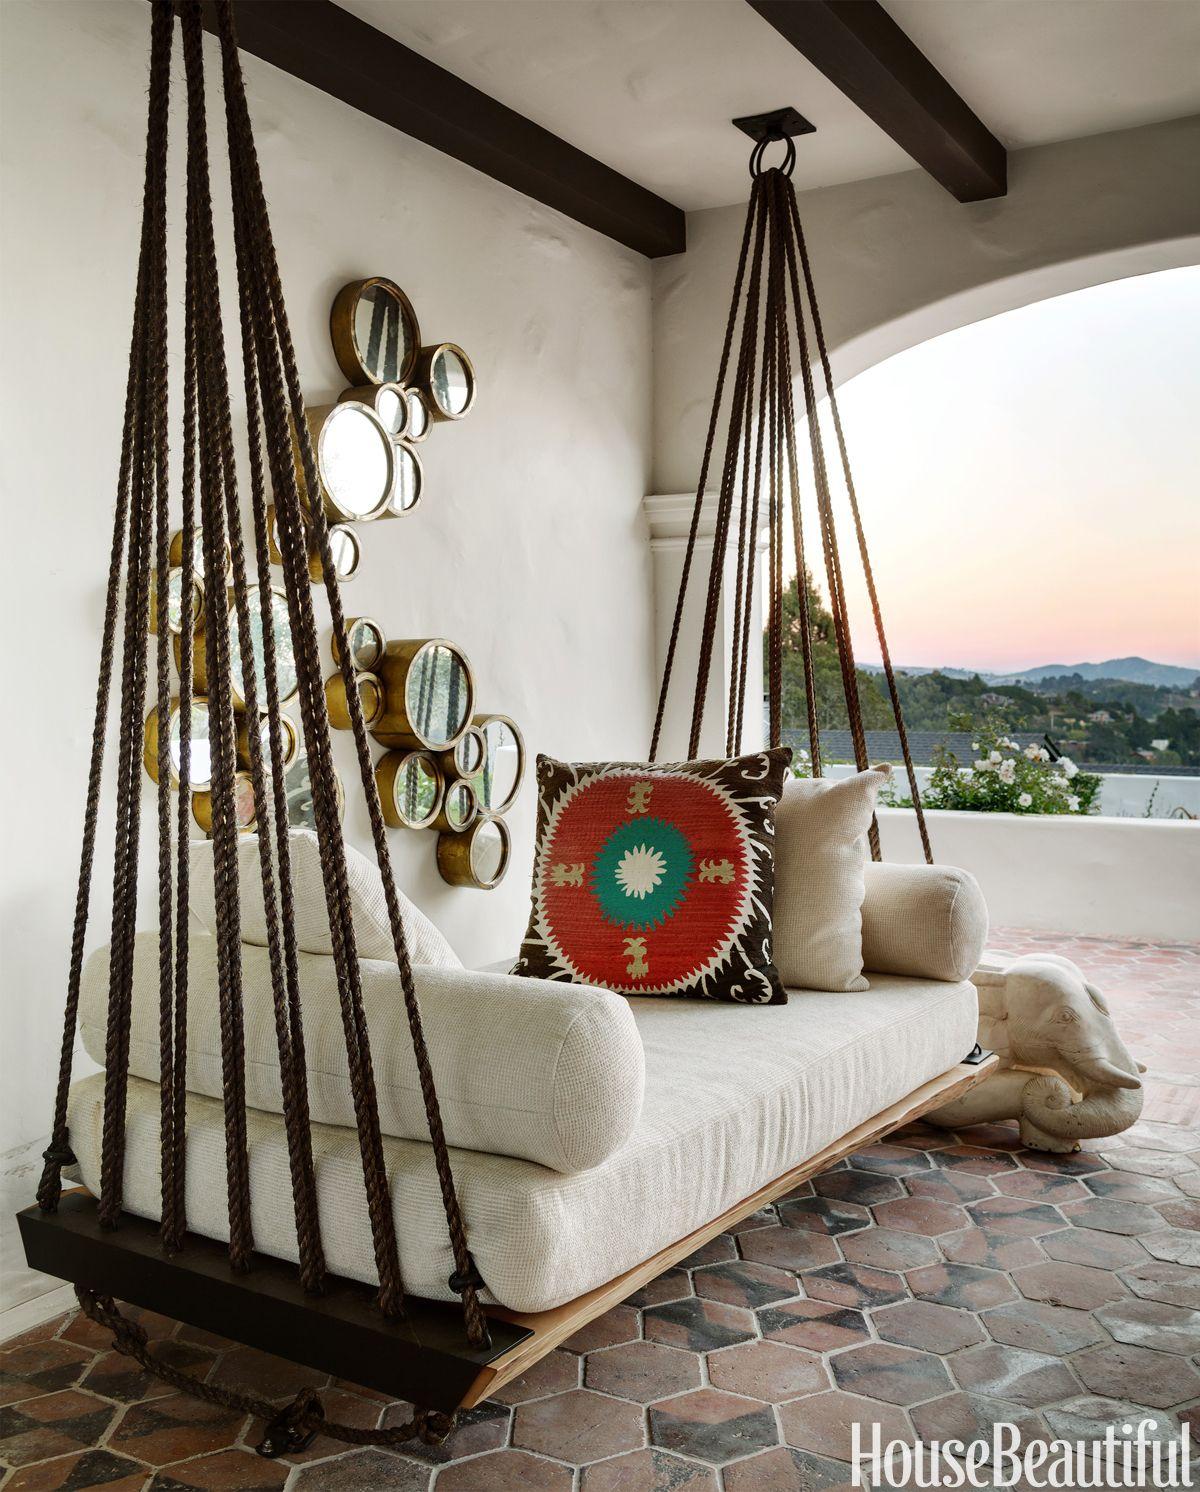 Indoor Hanging Swing Daybeds Excellent Home Design ...